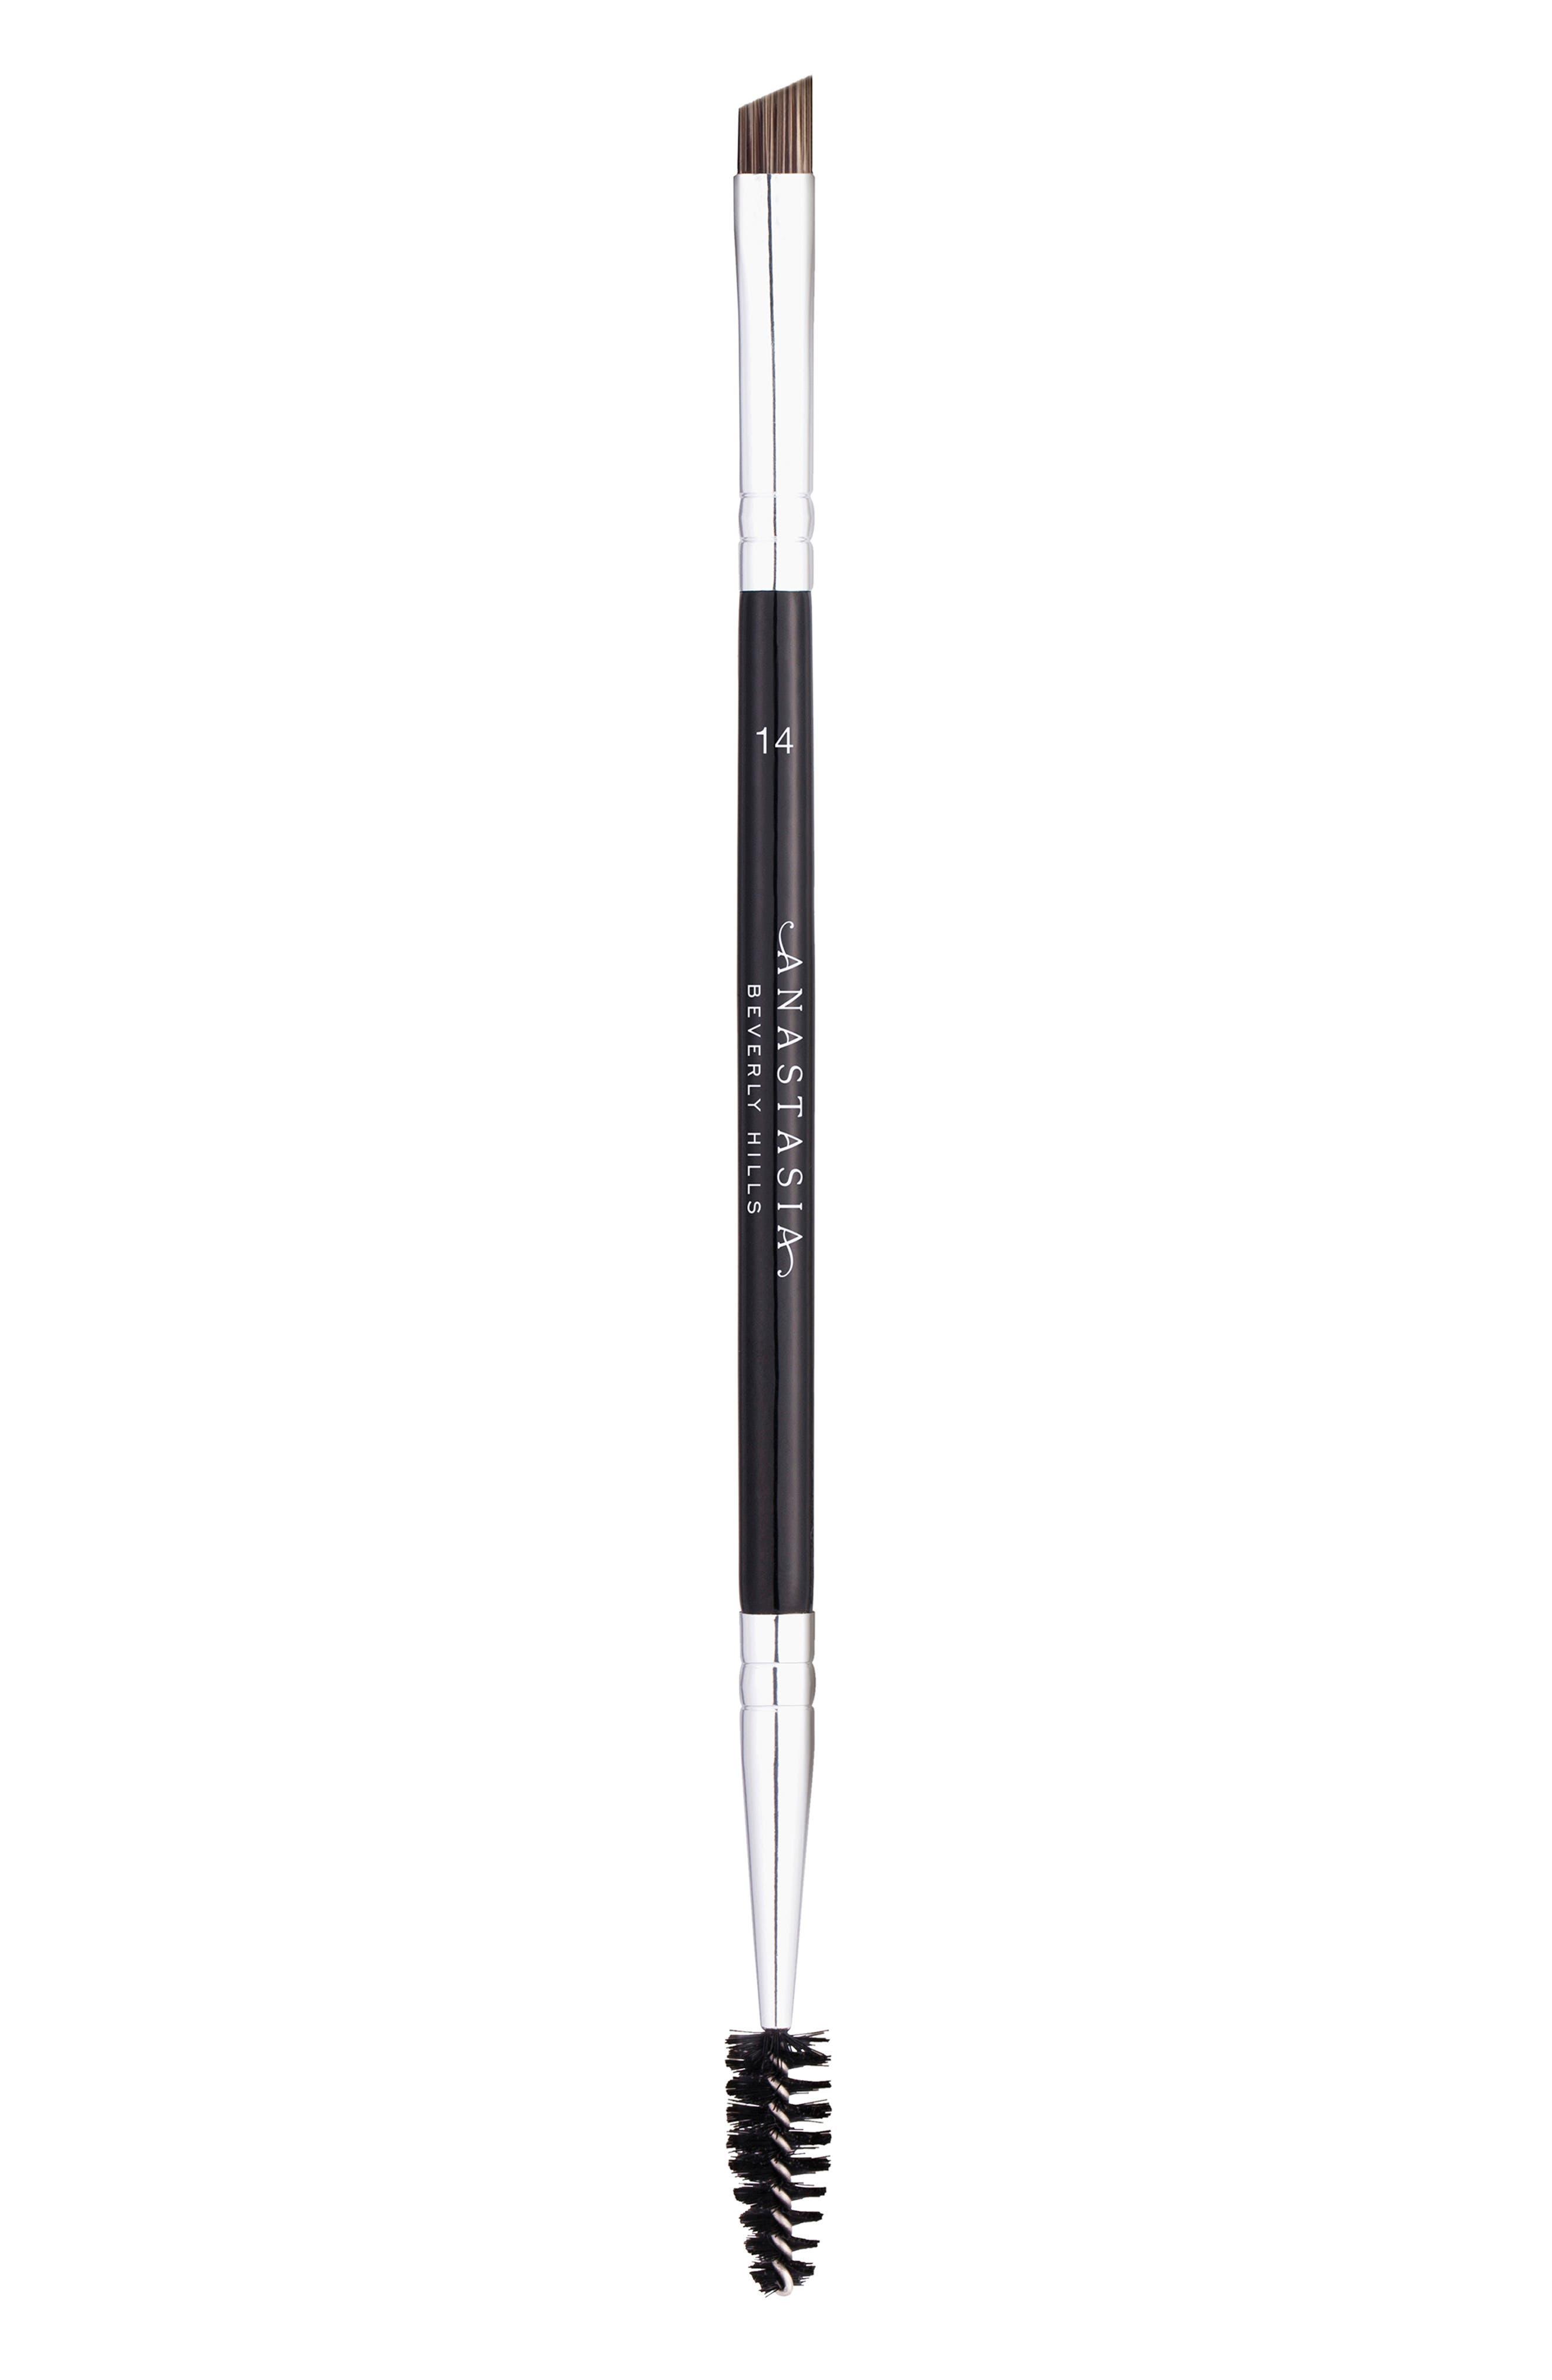 #14 Dual-Sided Brow & Eyeliner Brush | Nordstrom